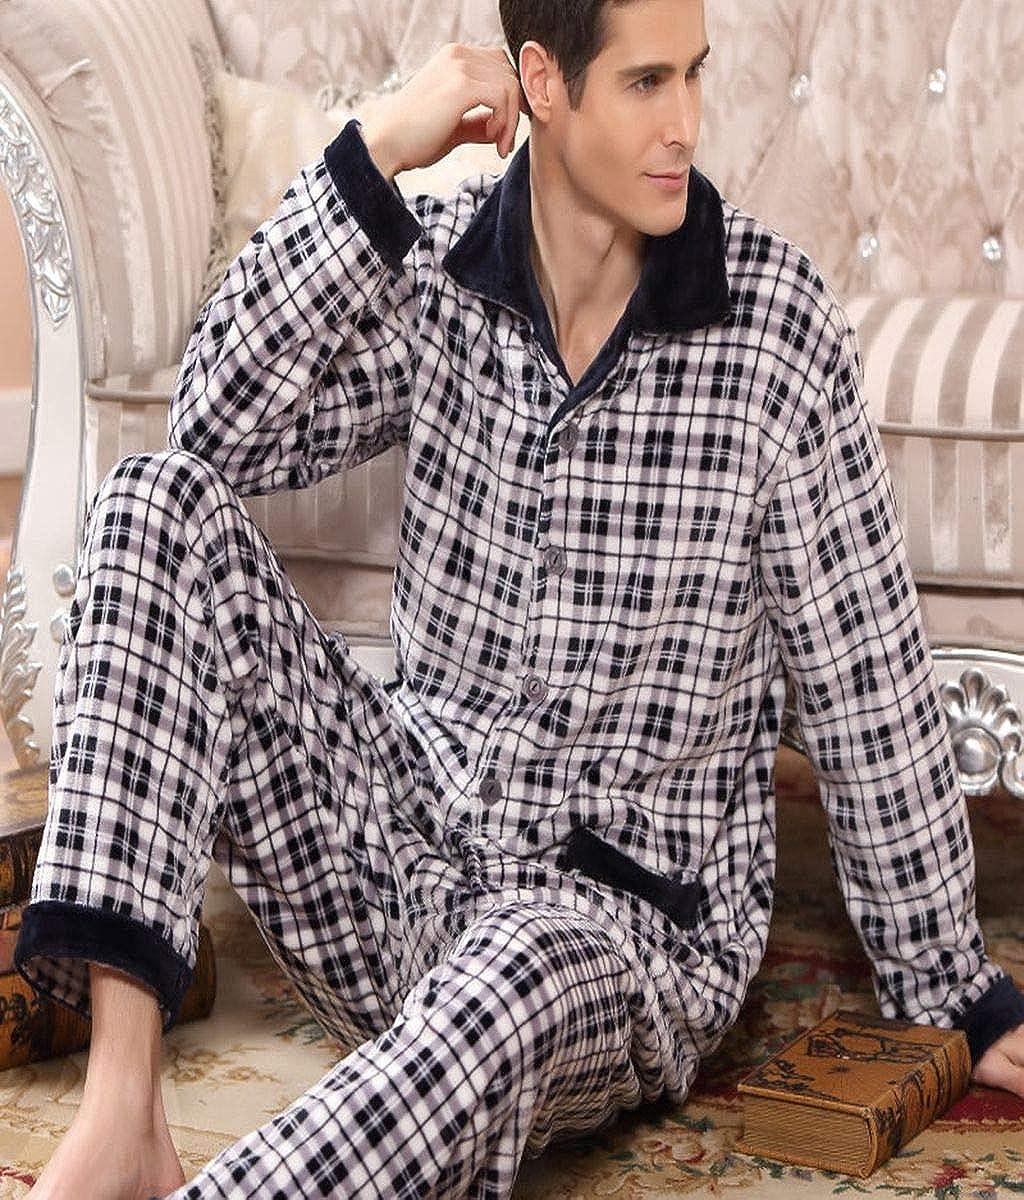 Men Thick Fleece Pajama Sets Luxury Warm Sleepwear Plaid Suits Man Casual Home Clothes